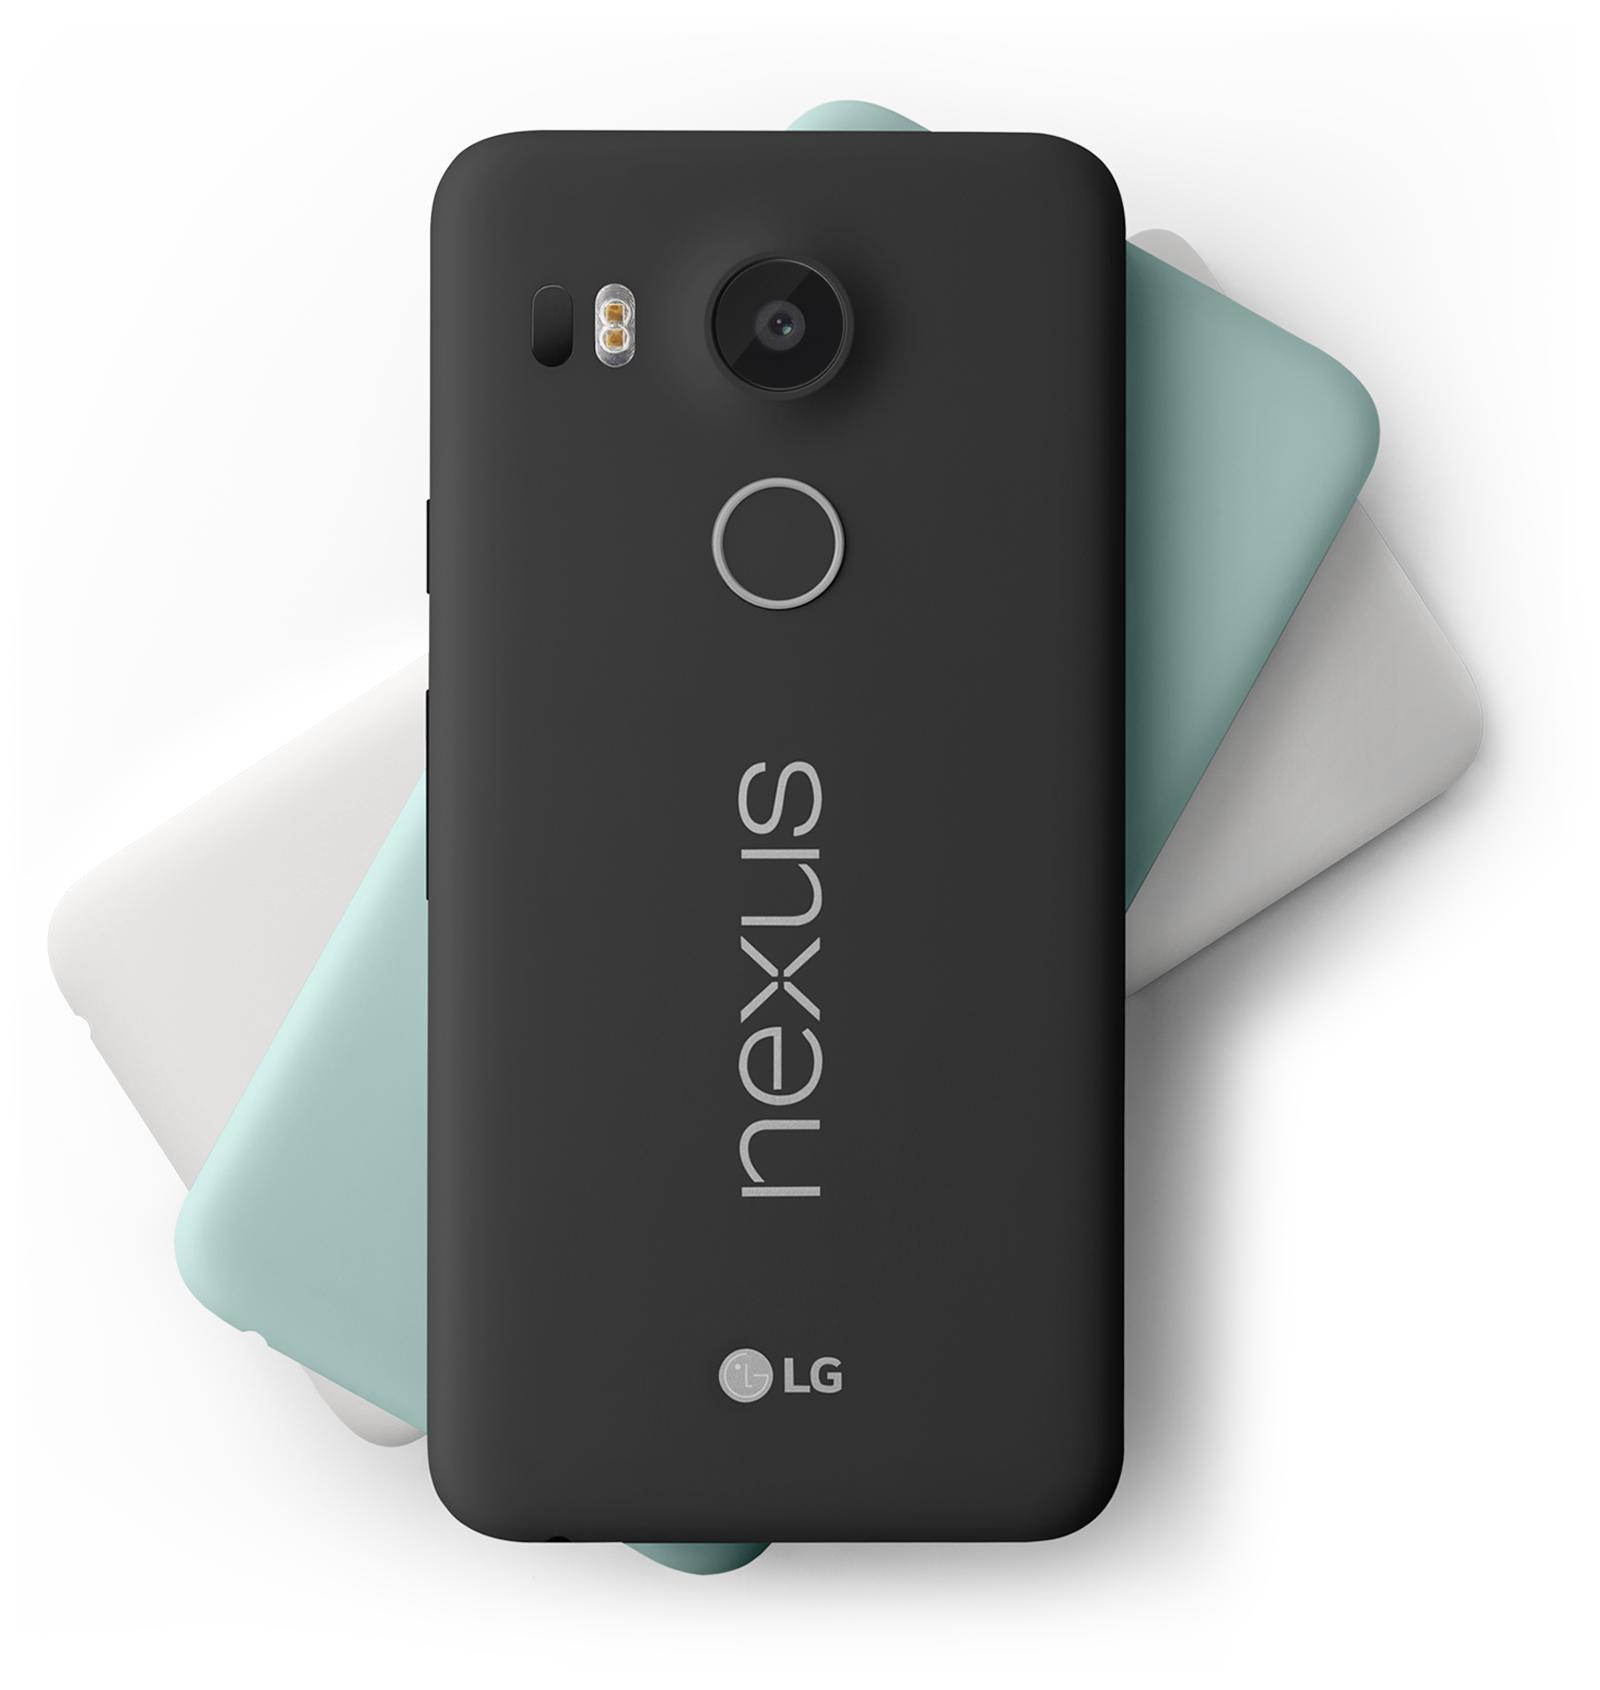 google-nexus-5x-LG